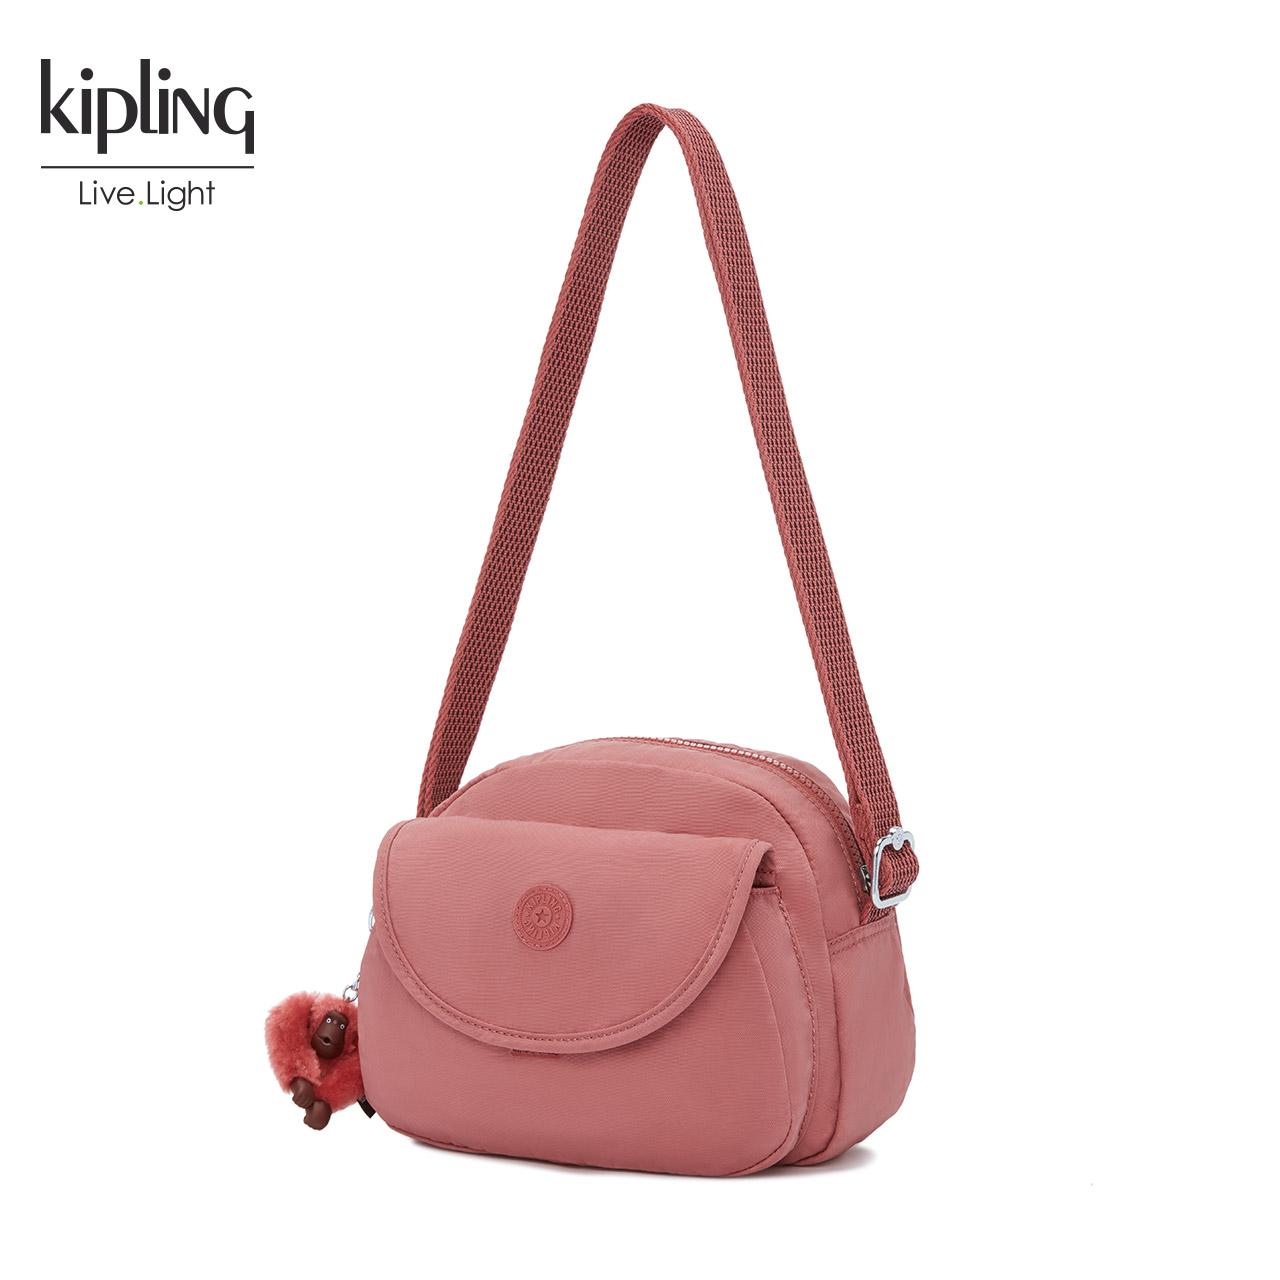 Kipling凯浦林包包女2018秋冬新款背提包可爱斜跨包单肩包